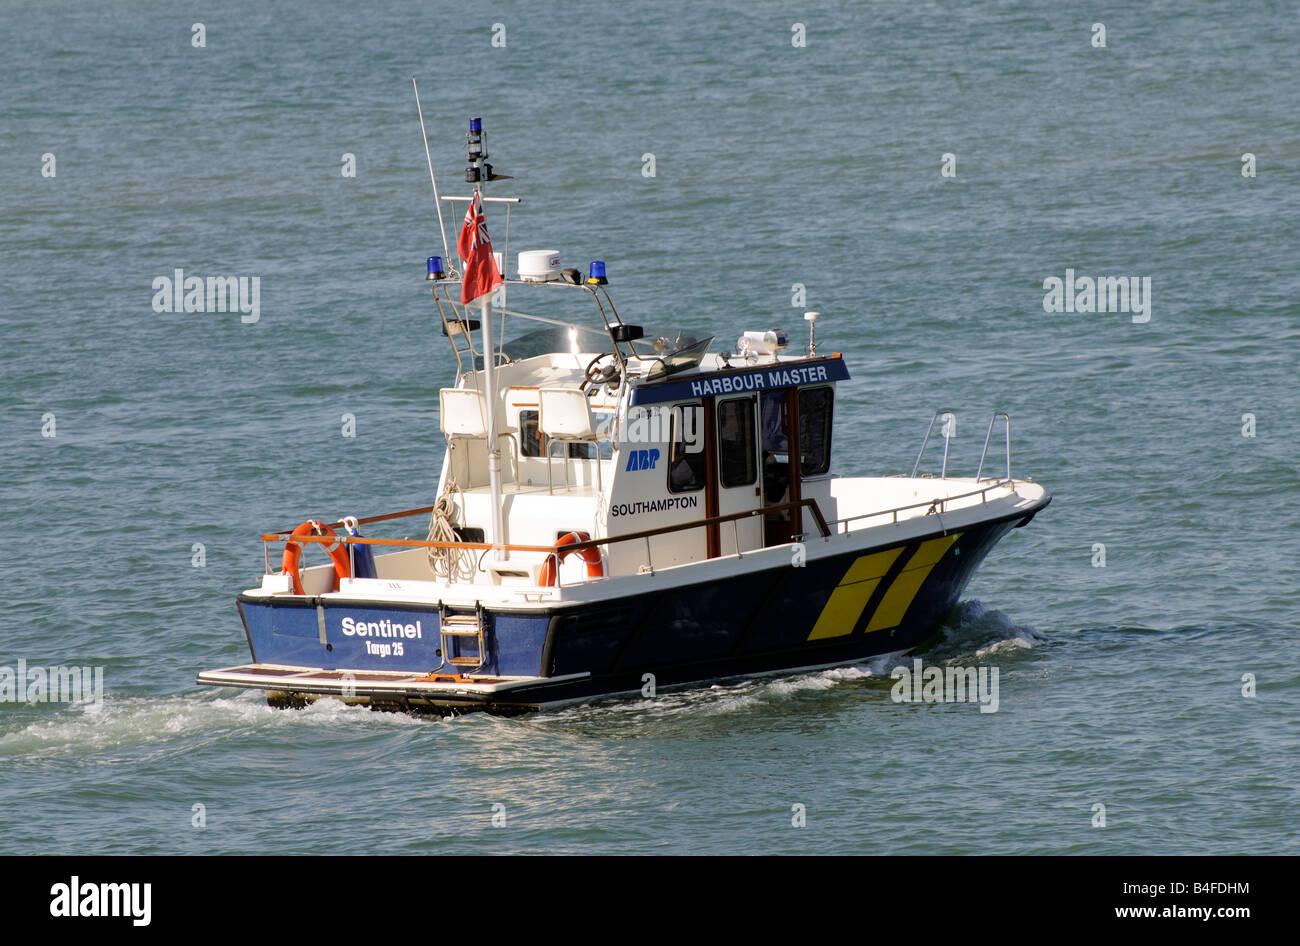 Harbour master launch ABP Southampton water England UK The Sentinel targa 25 - Stock Image